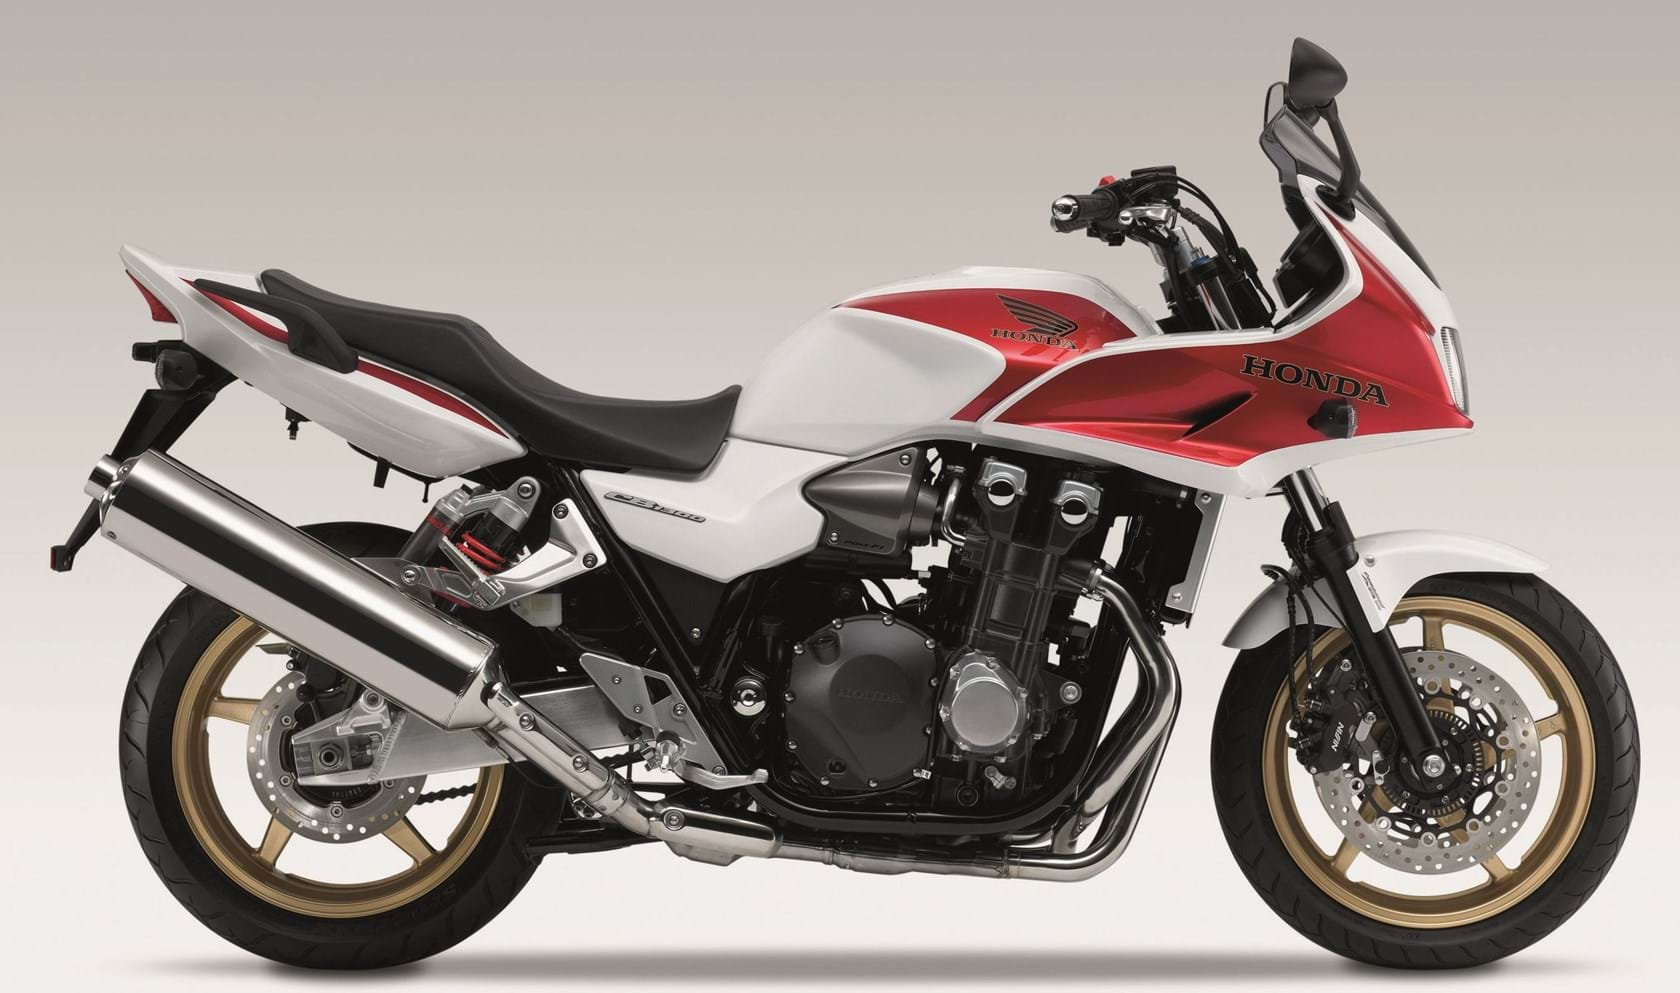 For Sale Honda Cb1300 The Bike Market